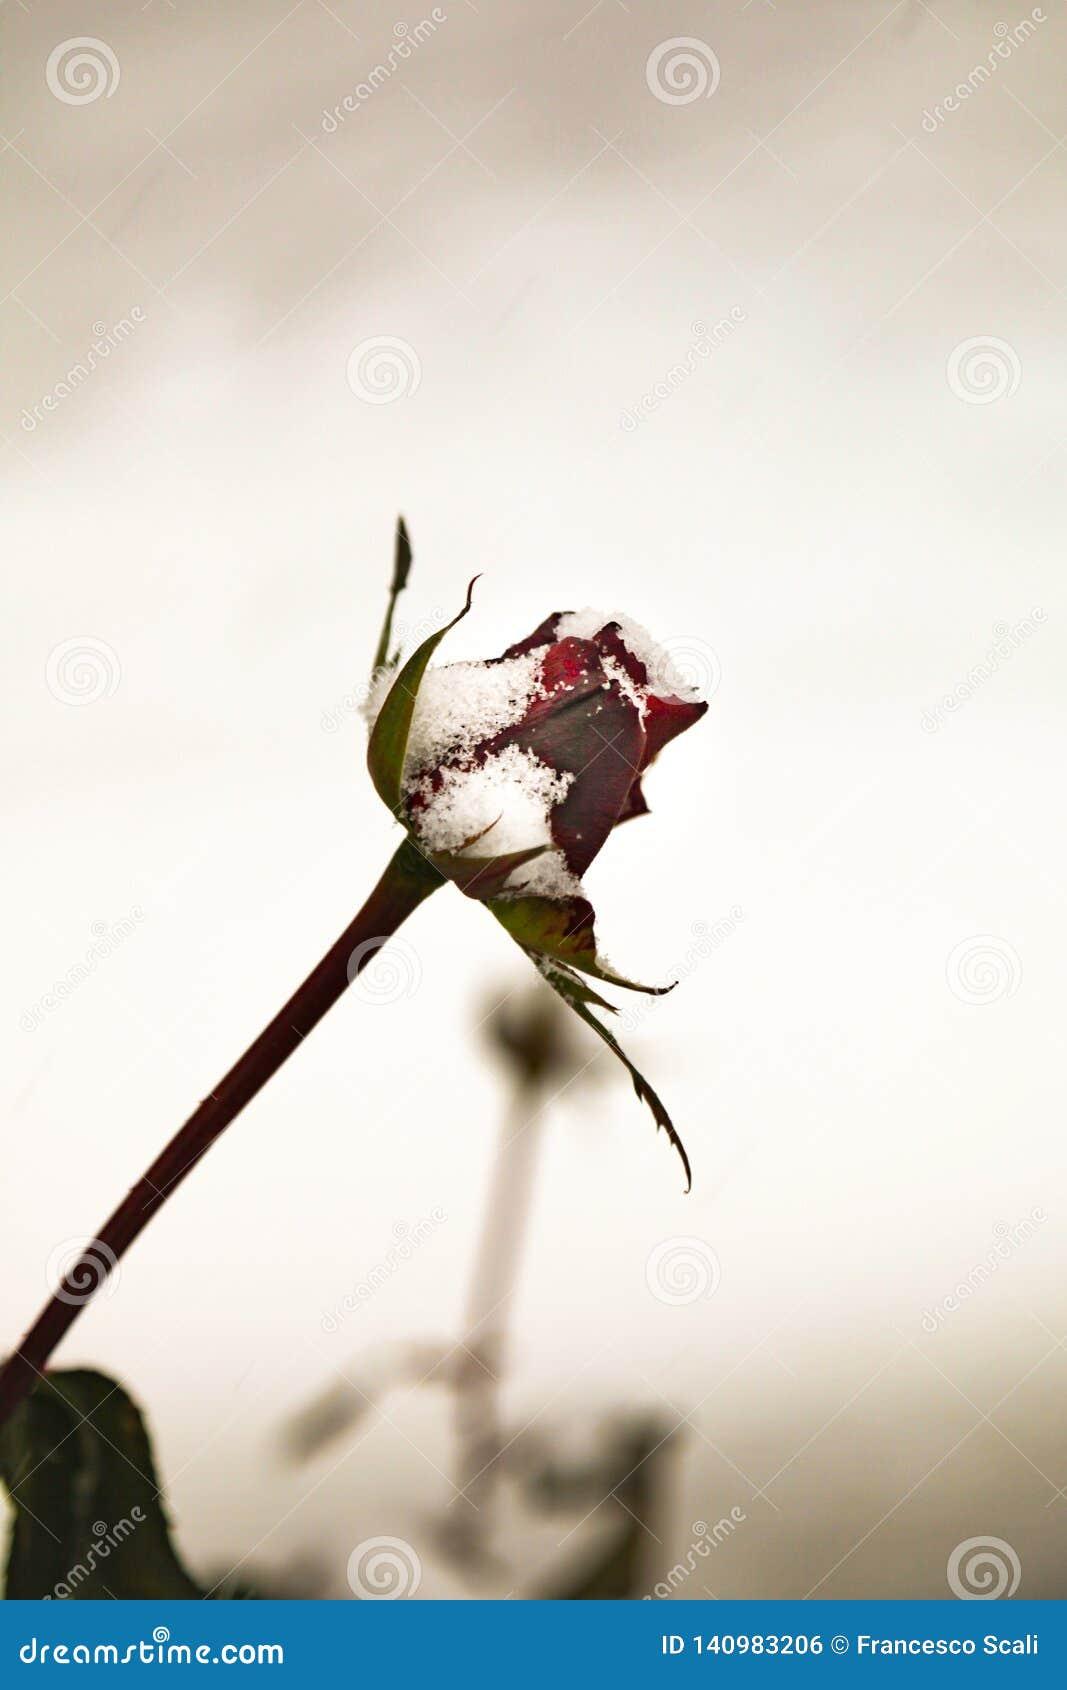 Snow on a rosebud